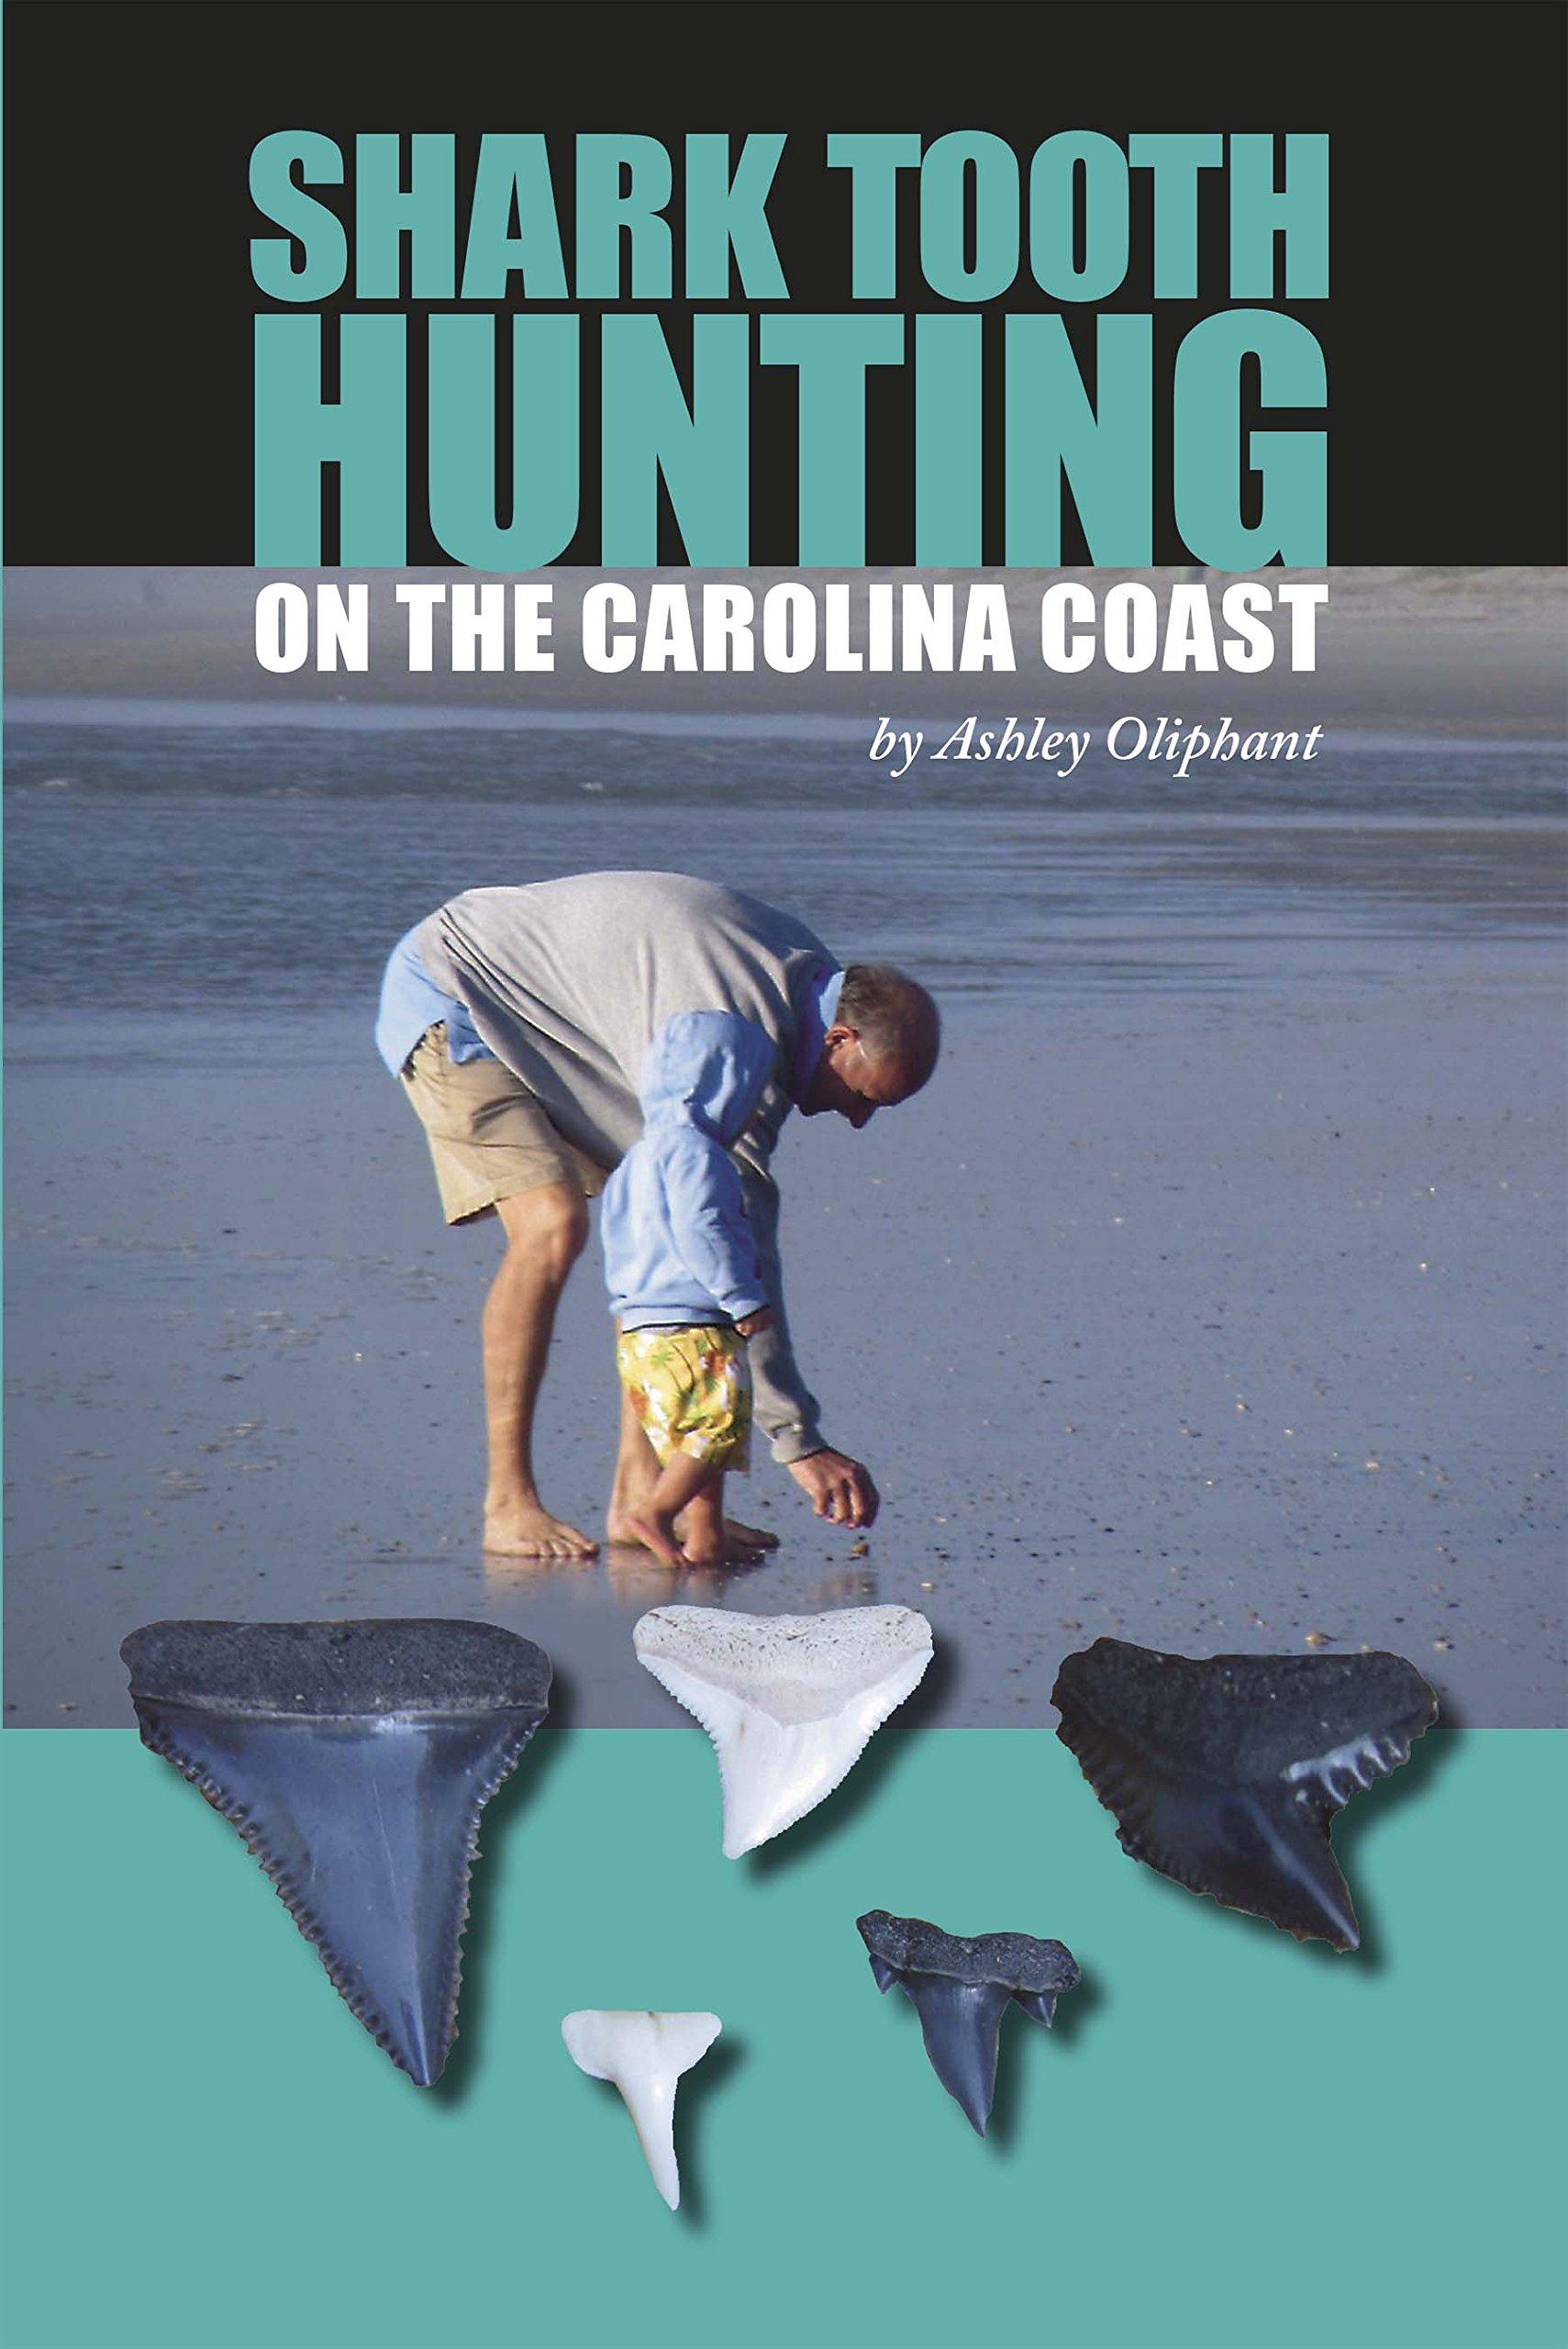 Shark Tooth Hunting Carolina Coast product image